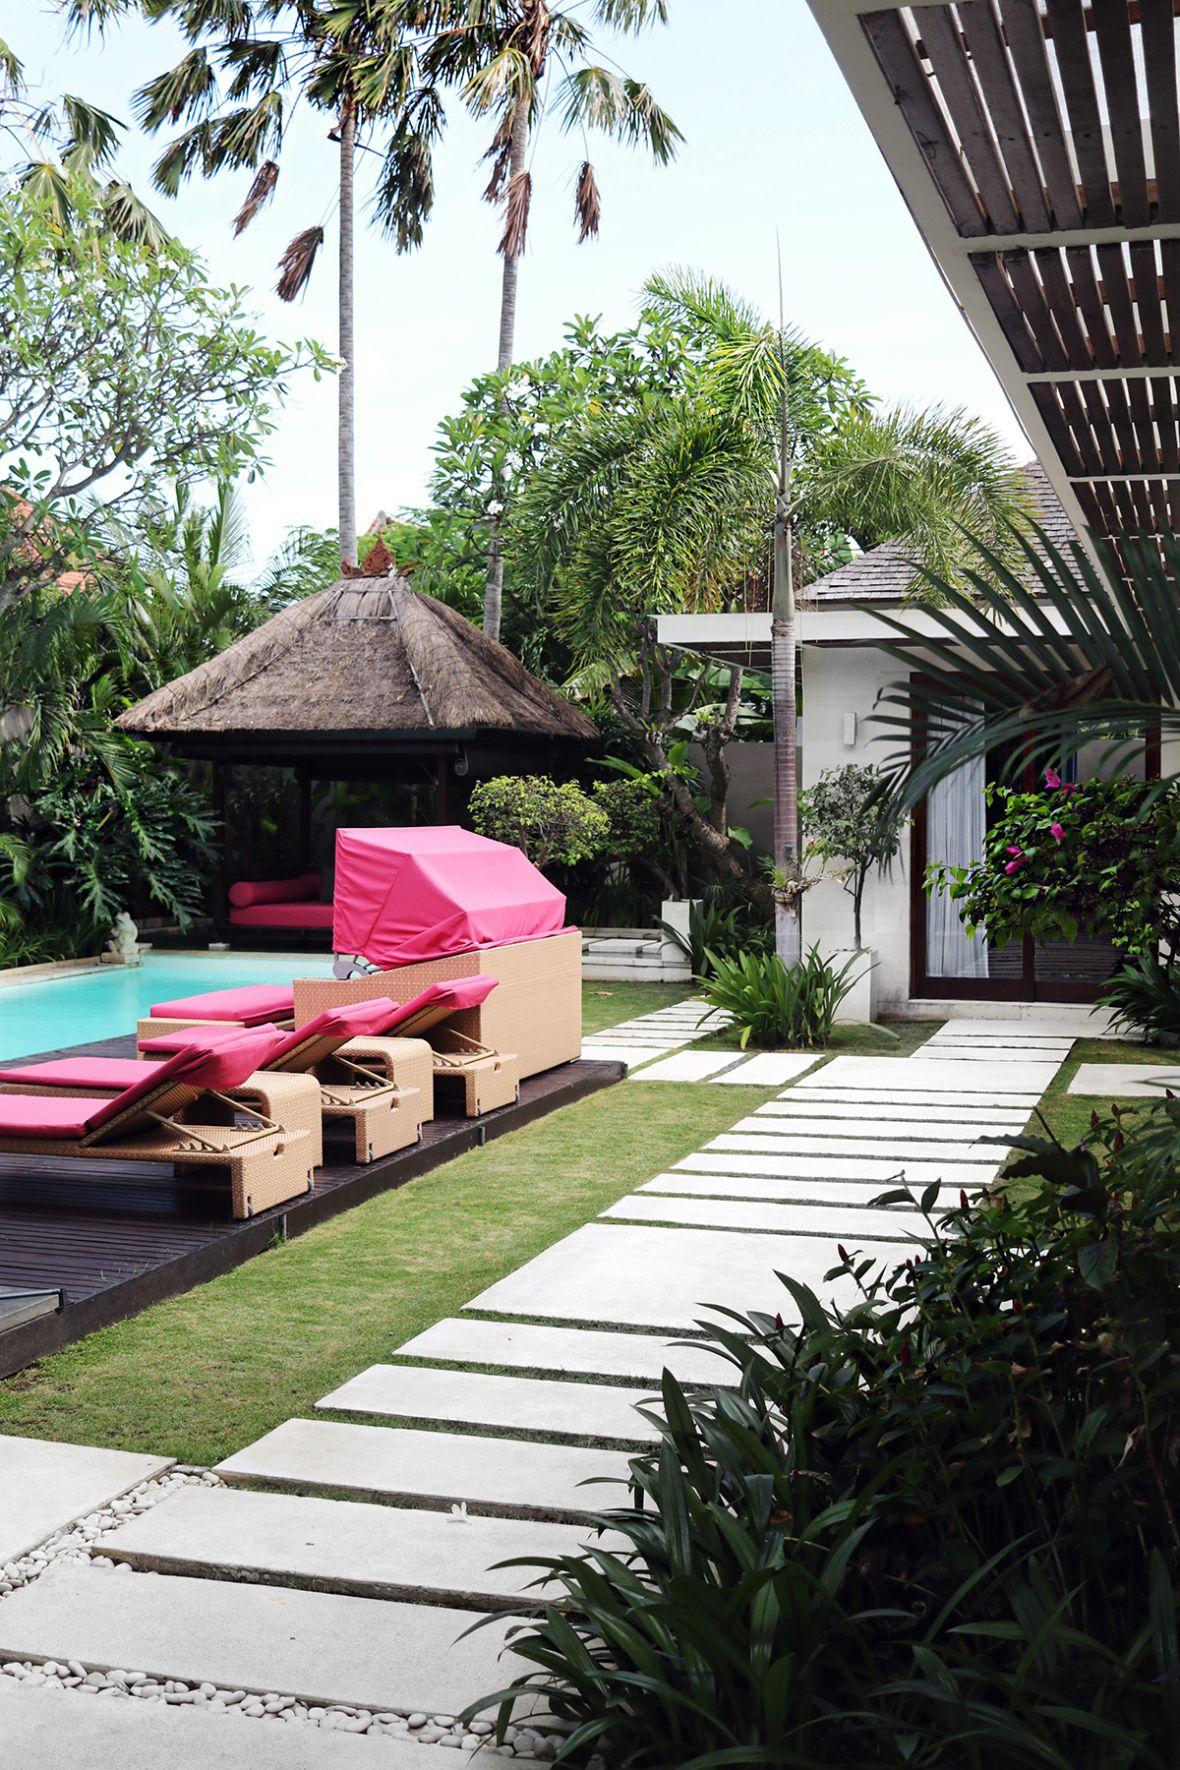 Chandra Bali Villas My Favorite Place In Bali More On The Blog Www Andathousandwords Com Bali Garden Outdoor Gardens Design Bali